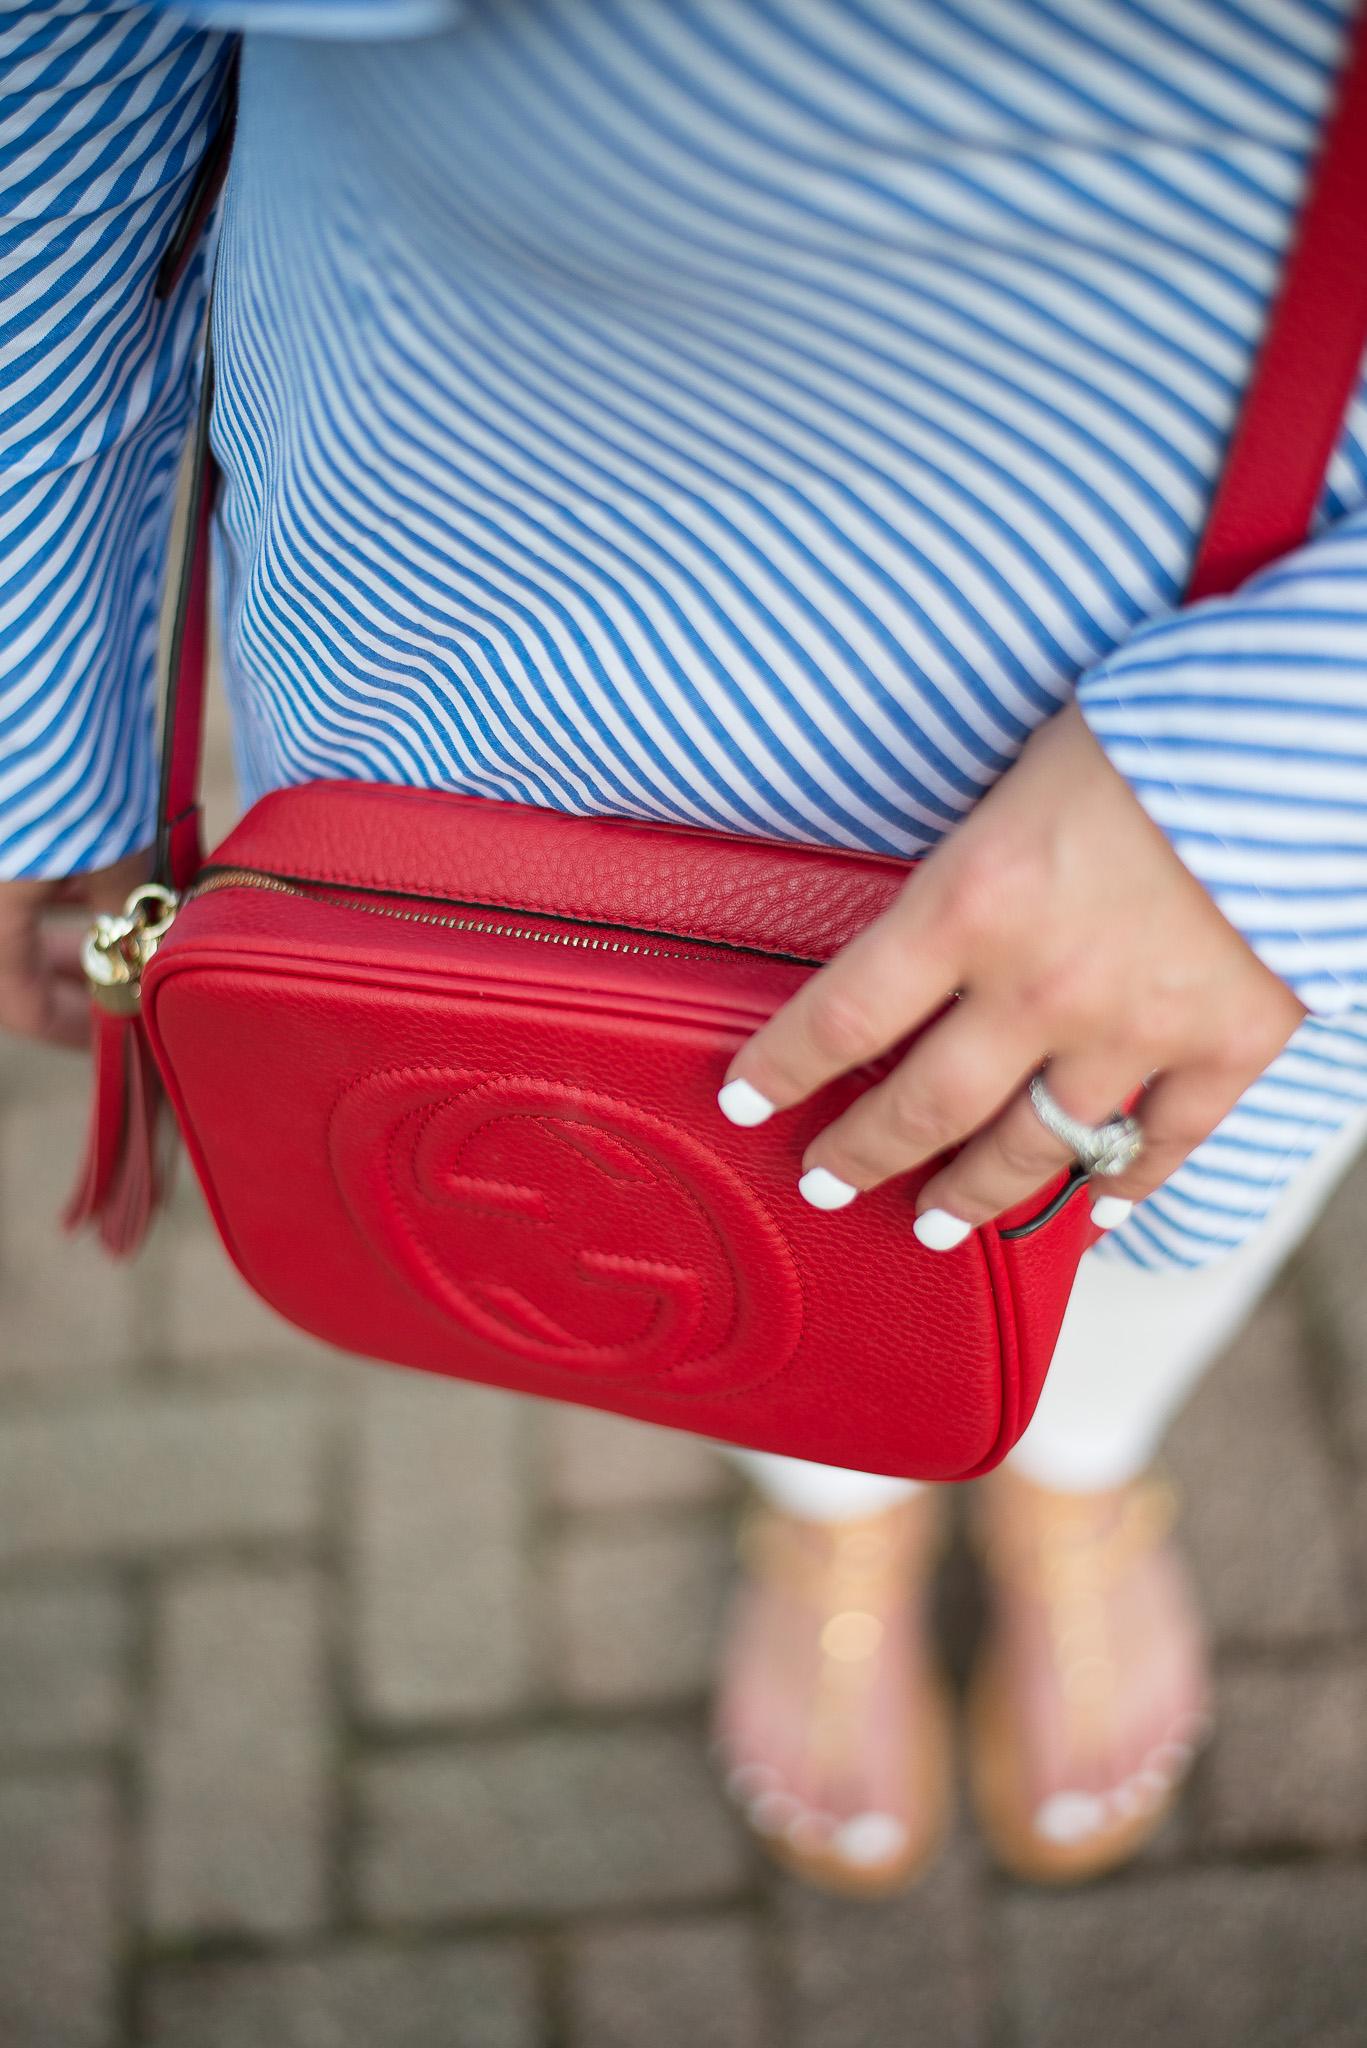 Red Gucci Soho Handbag